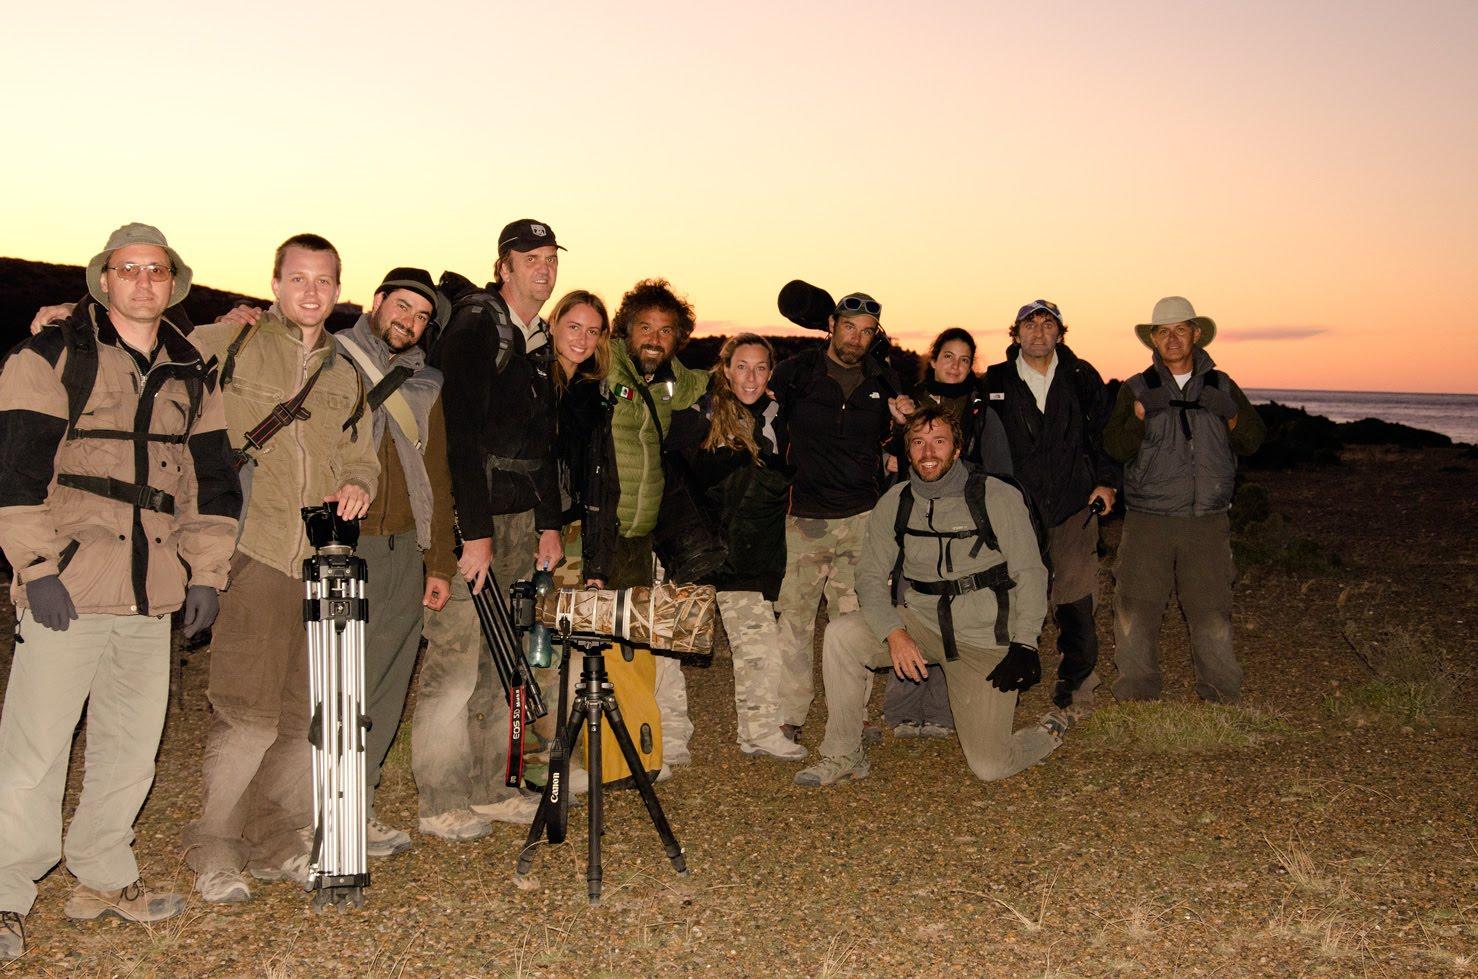 Fotógrafos saliendo del canal de ataque al atardecer